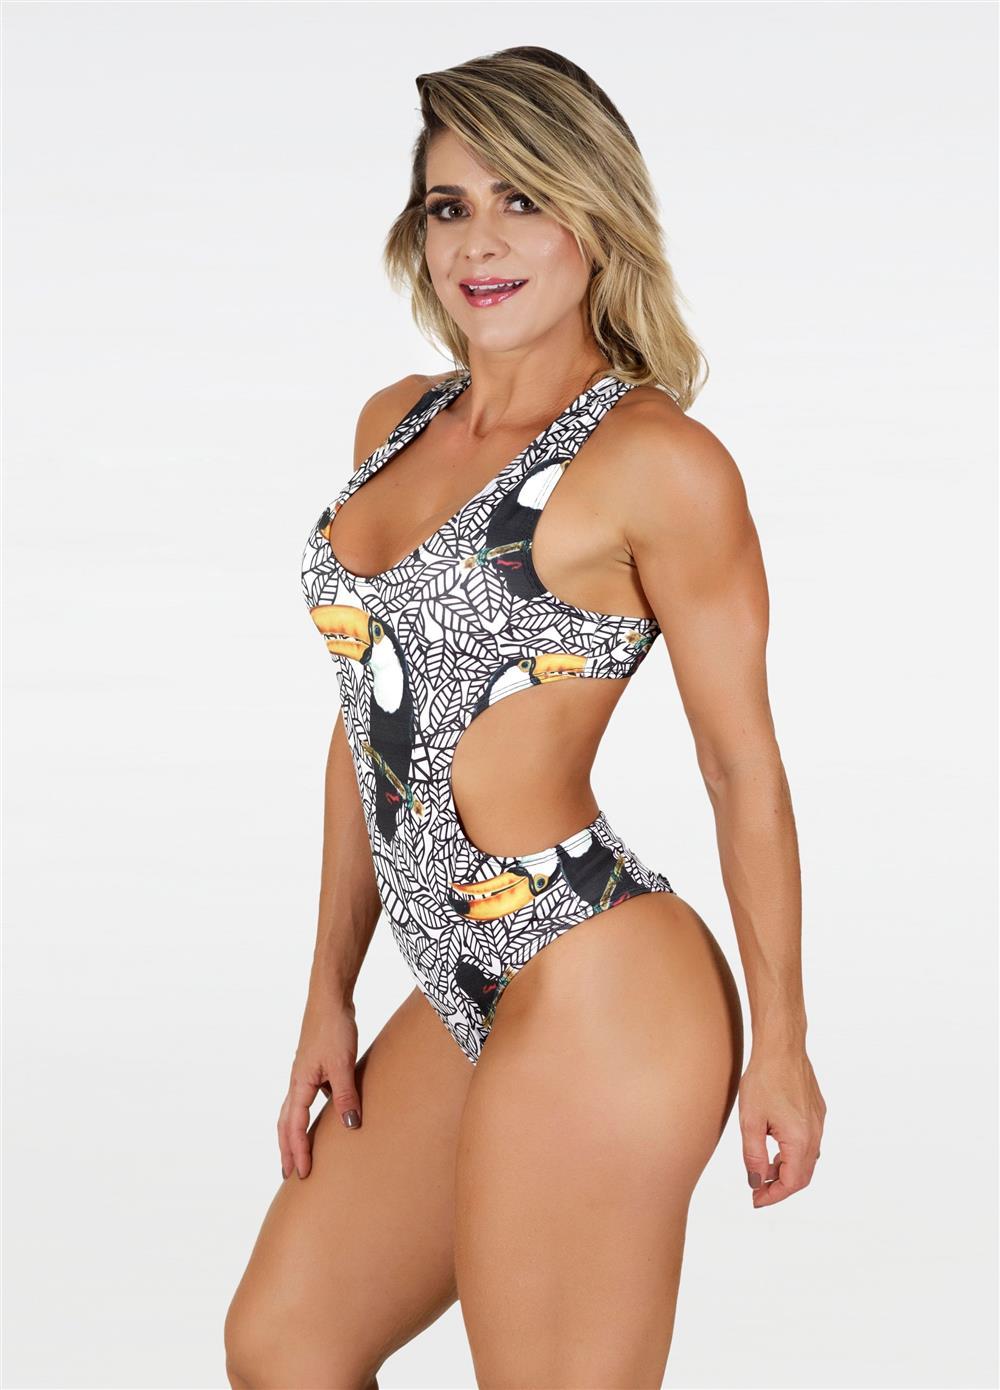 Body Jenifer Tucano Branco  - Fribasex - Fabricasex.com